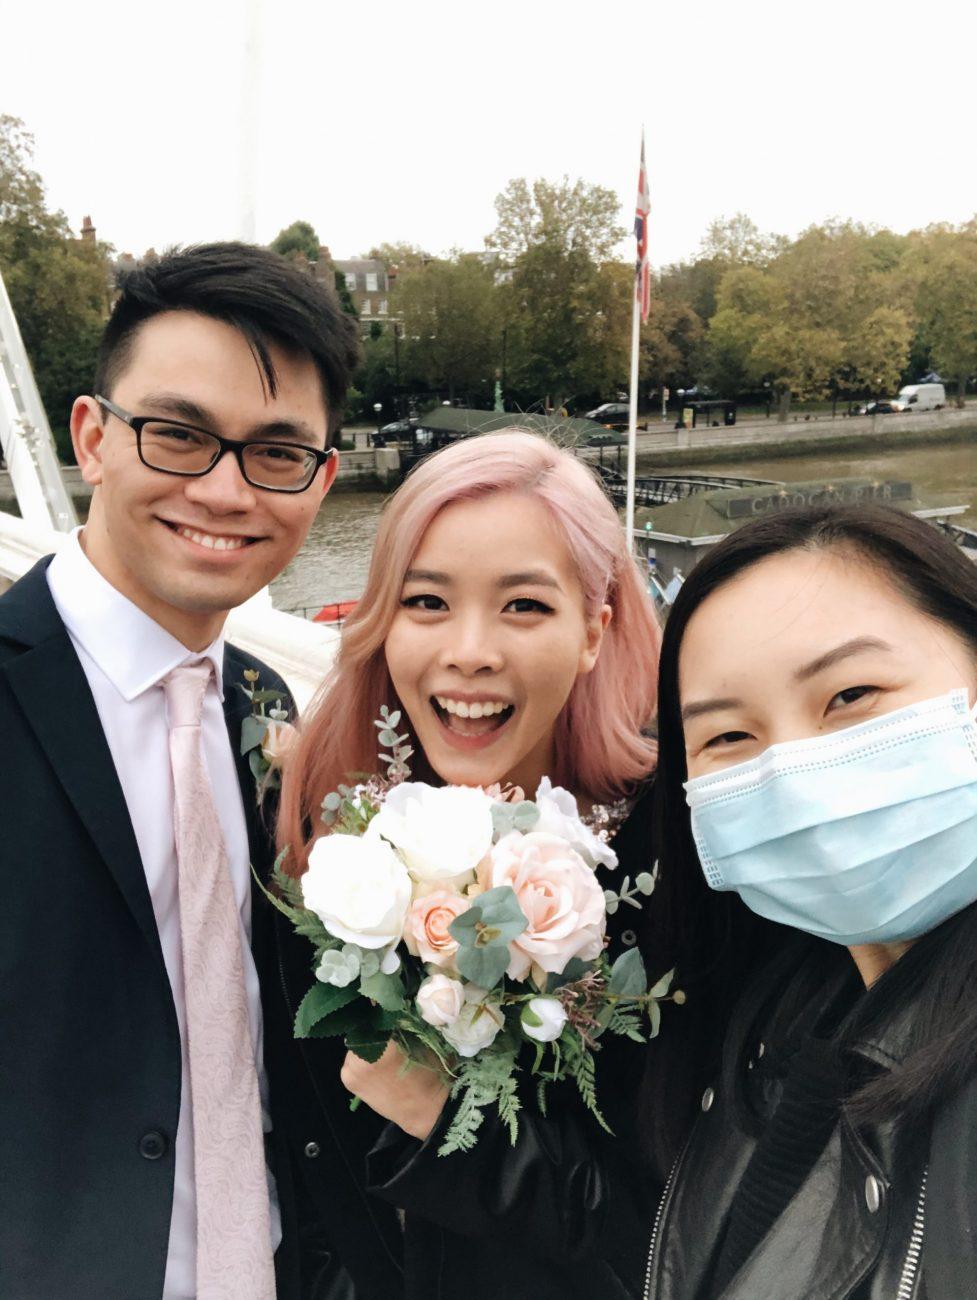 wedding photographer surrey london uk couple